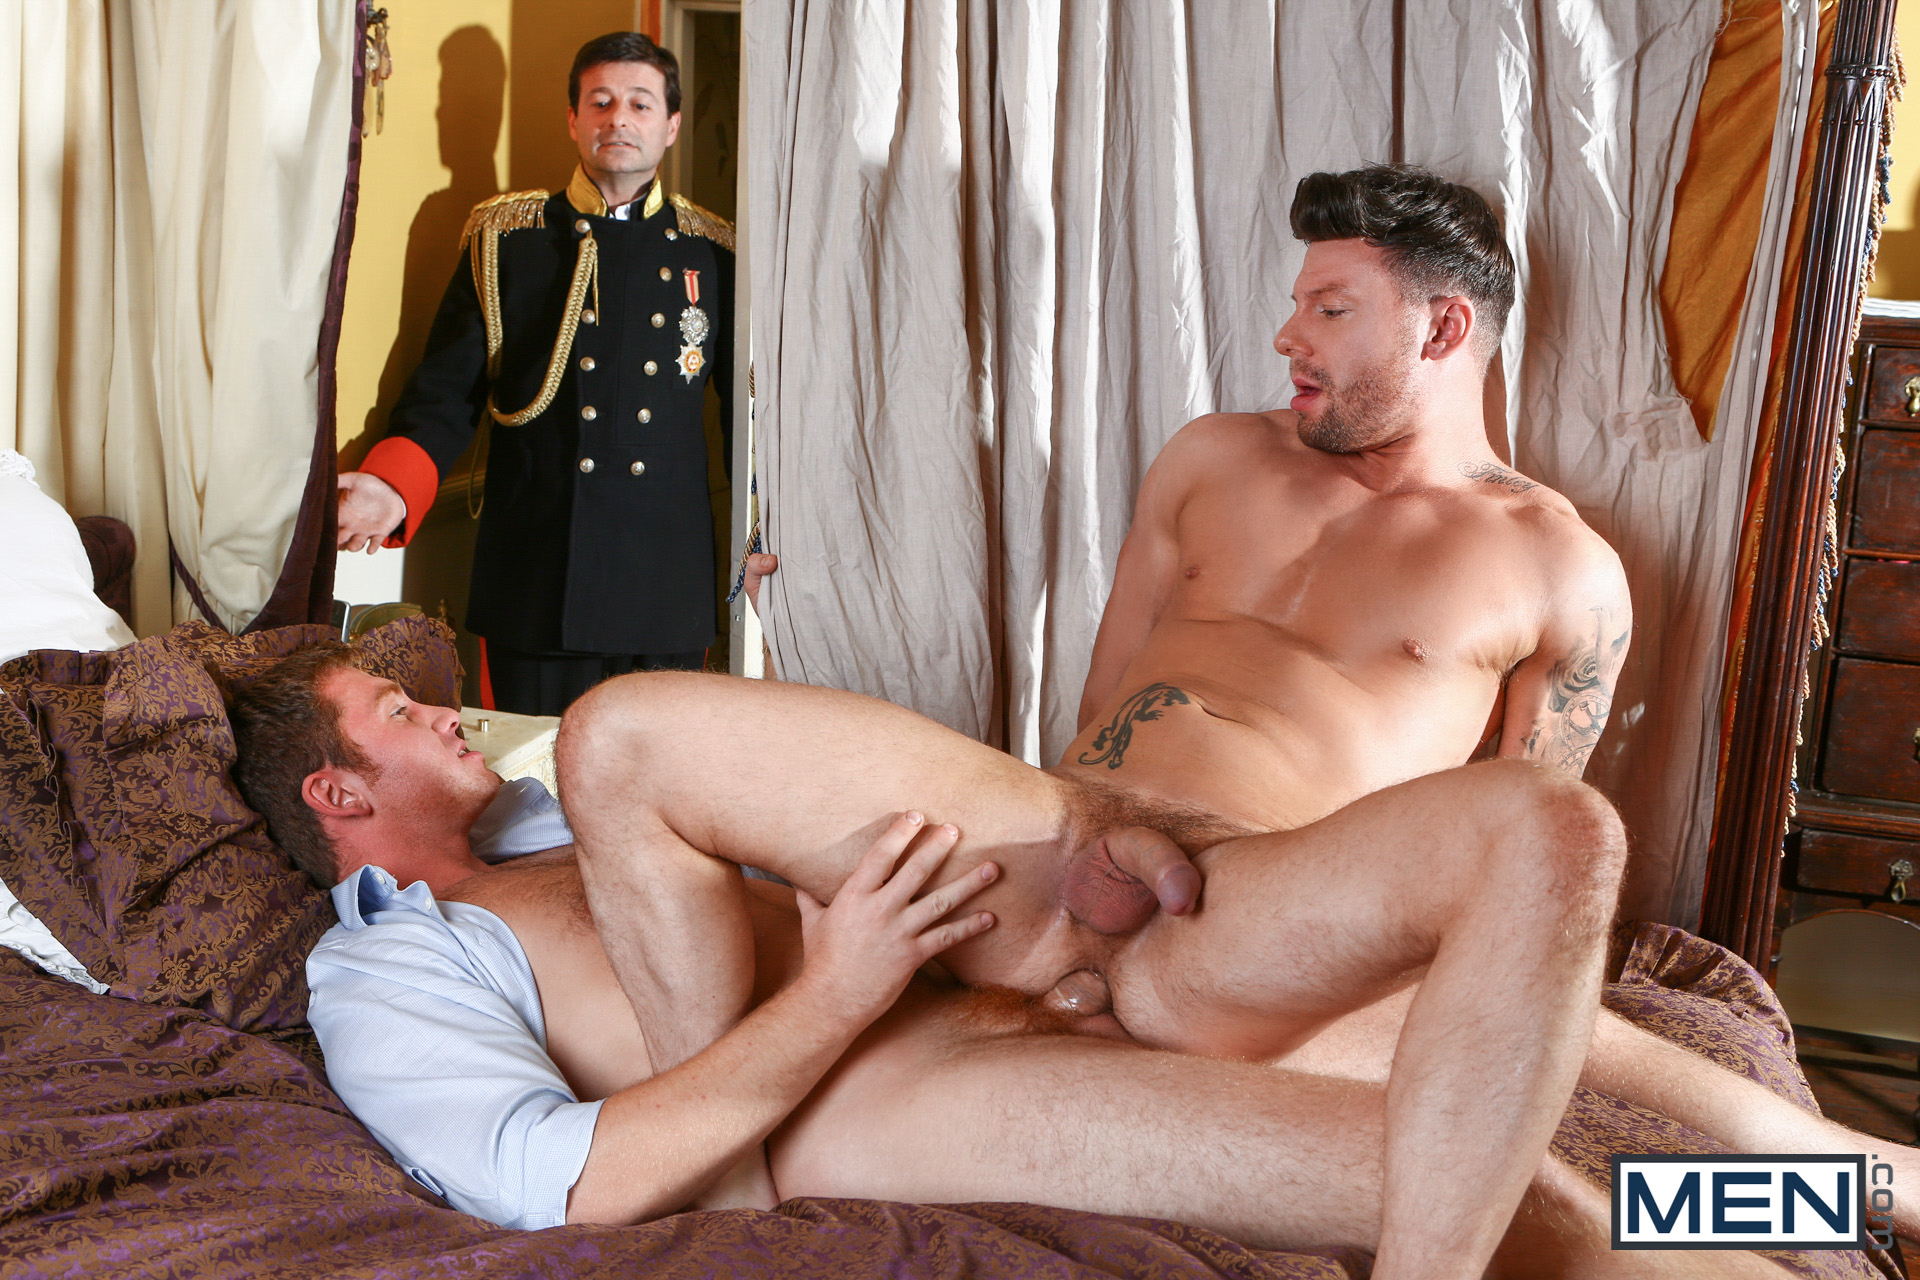 A Royal Fuckfest Gay Porn Free connor maguire & theo reid - gay - a royal fuckfest part 1: